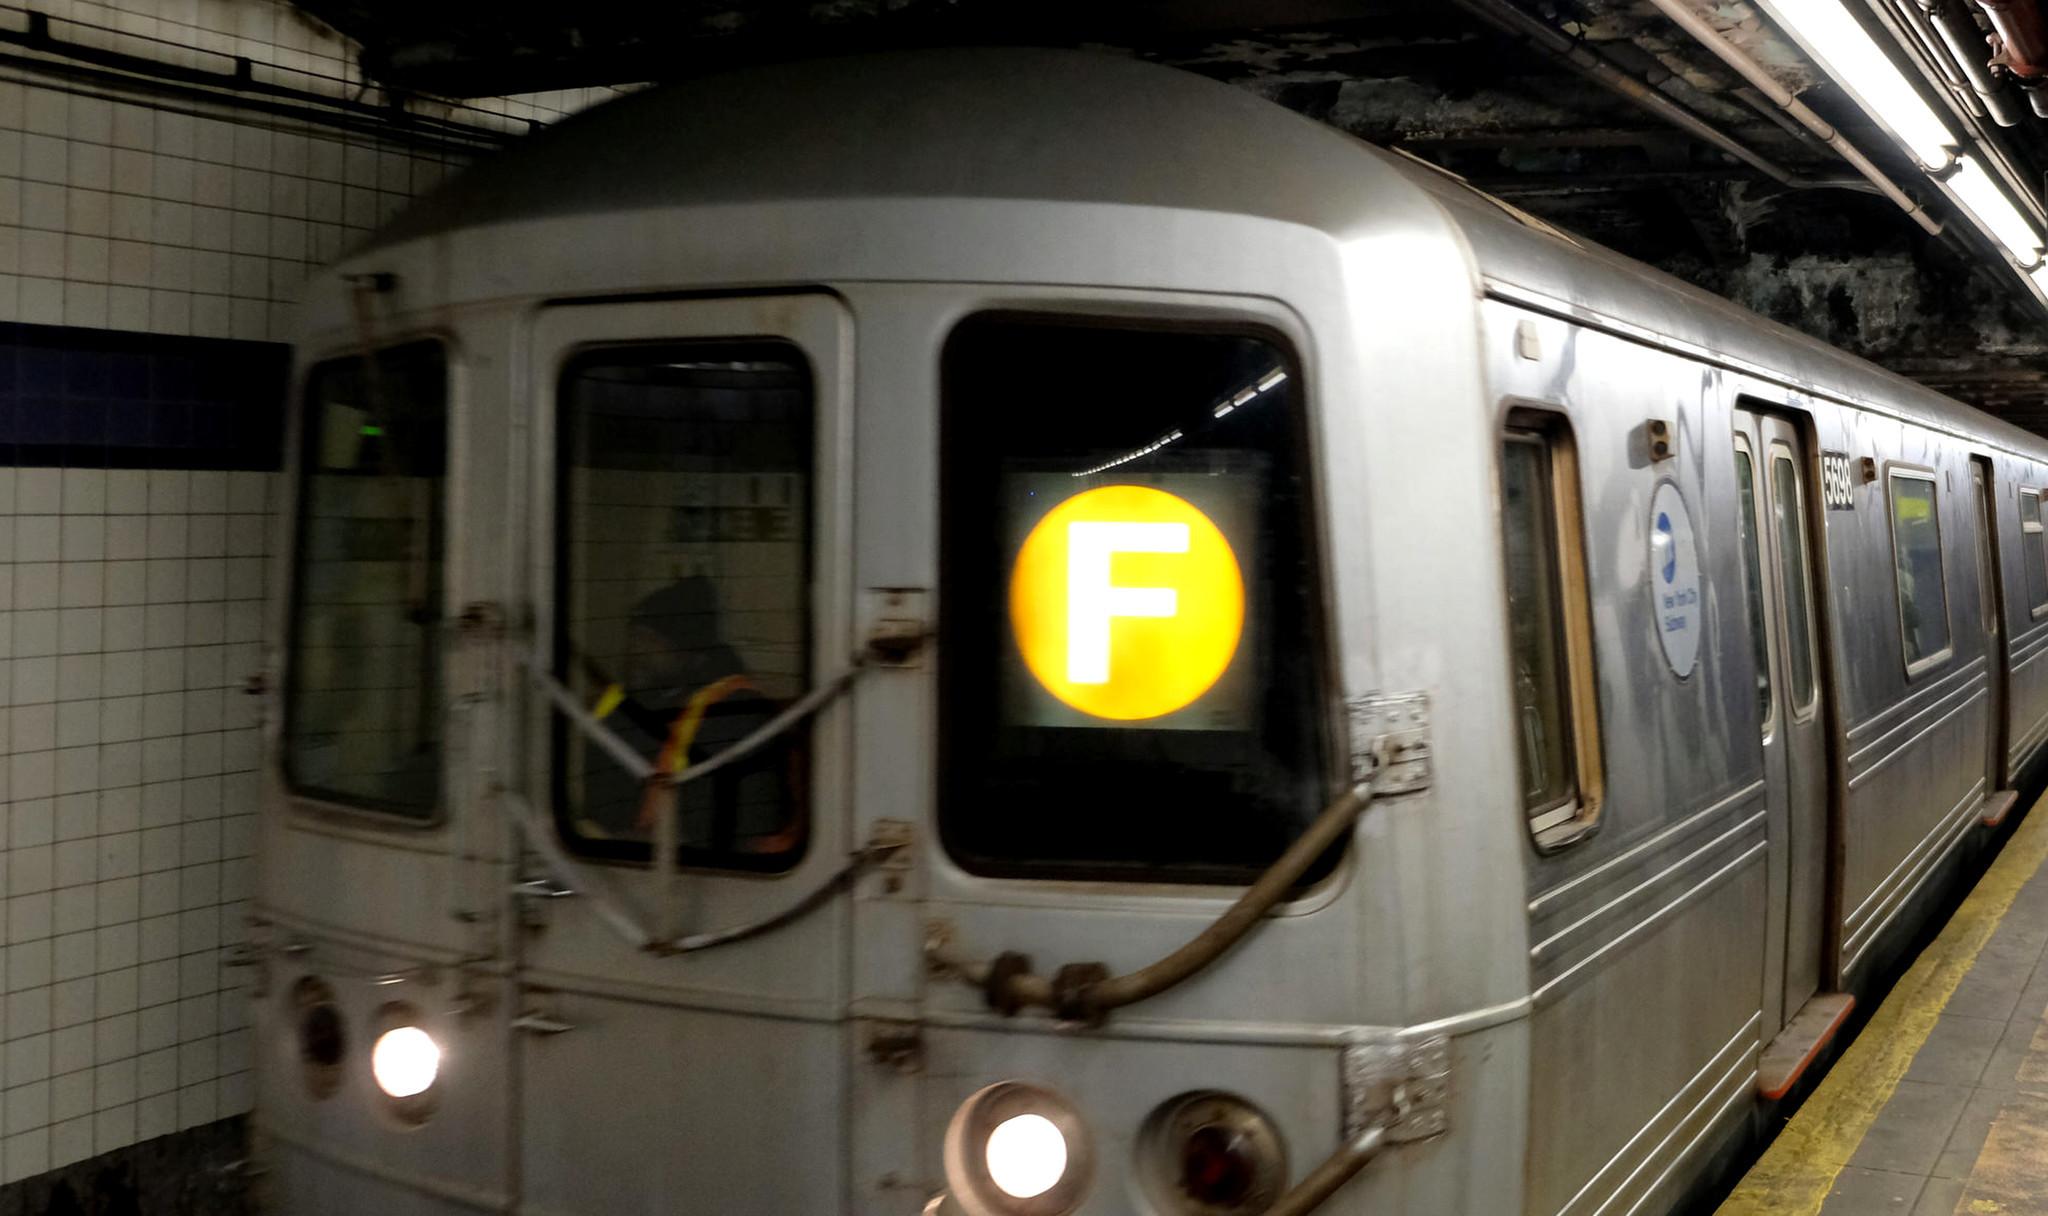 170 straphangers evacuated when subway train derails in Queens